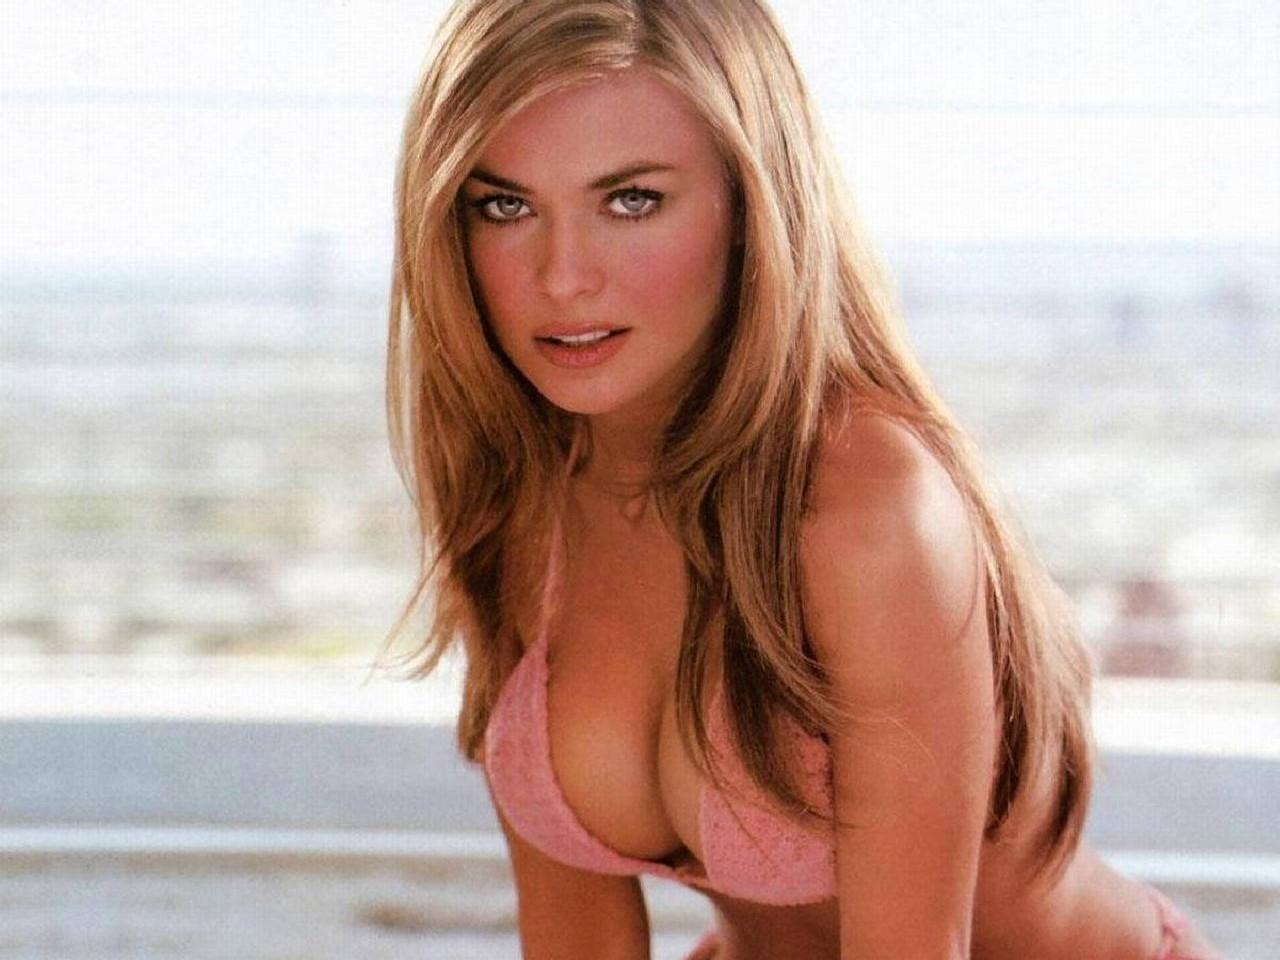 Wallpaper di Carmen Electra in bikini rosa